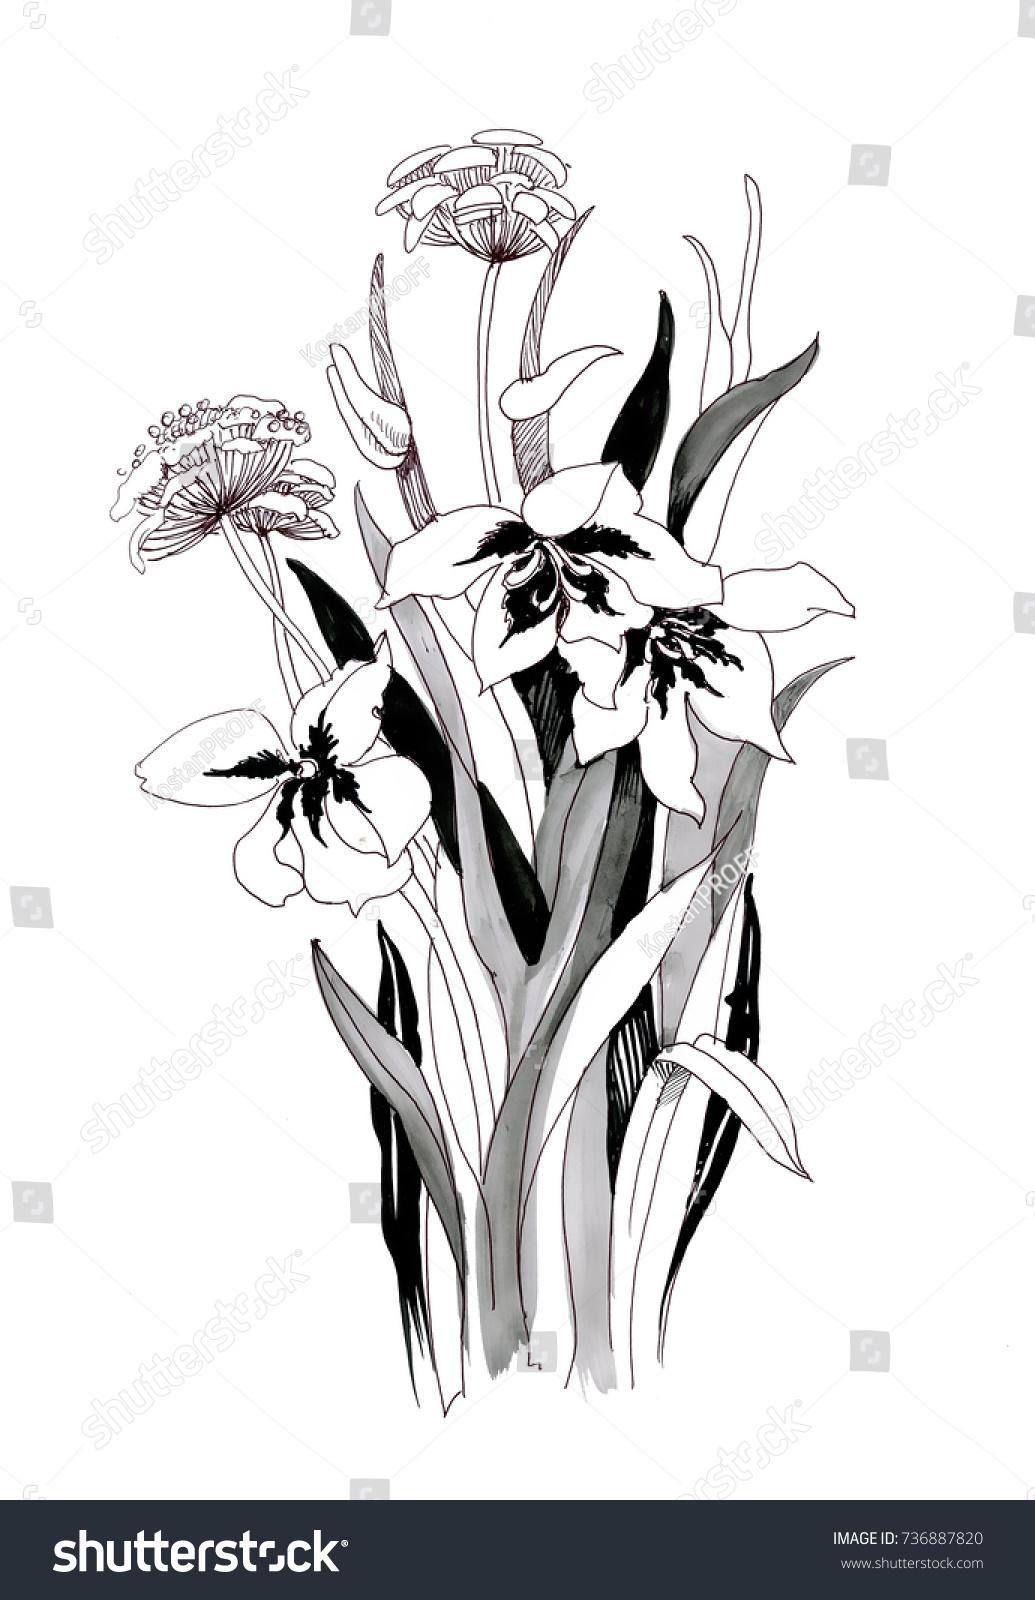 Hand Drawn Painting Black White Flowers Stock Illustration 736887820